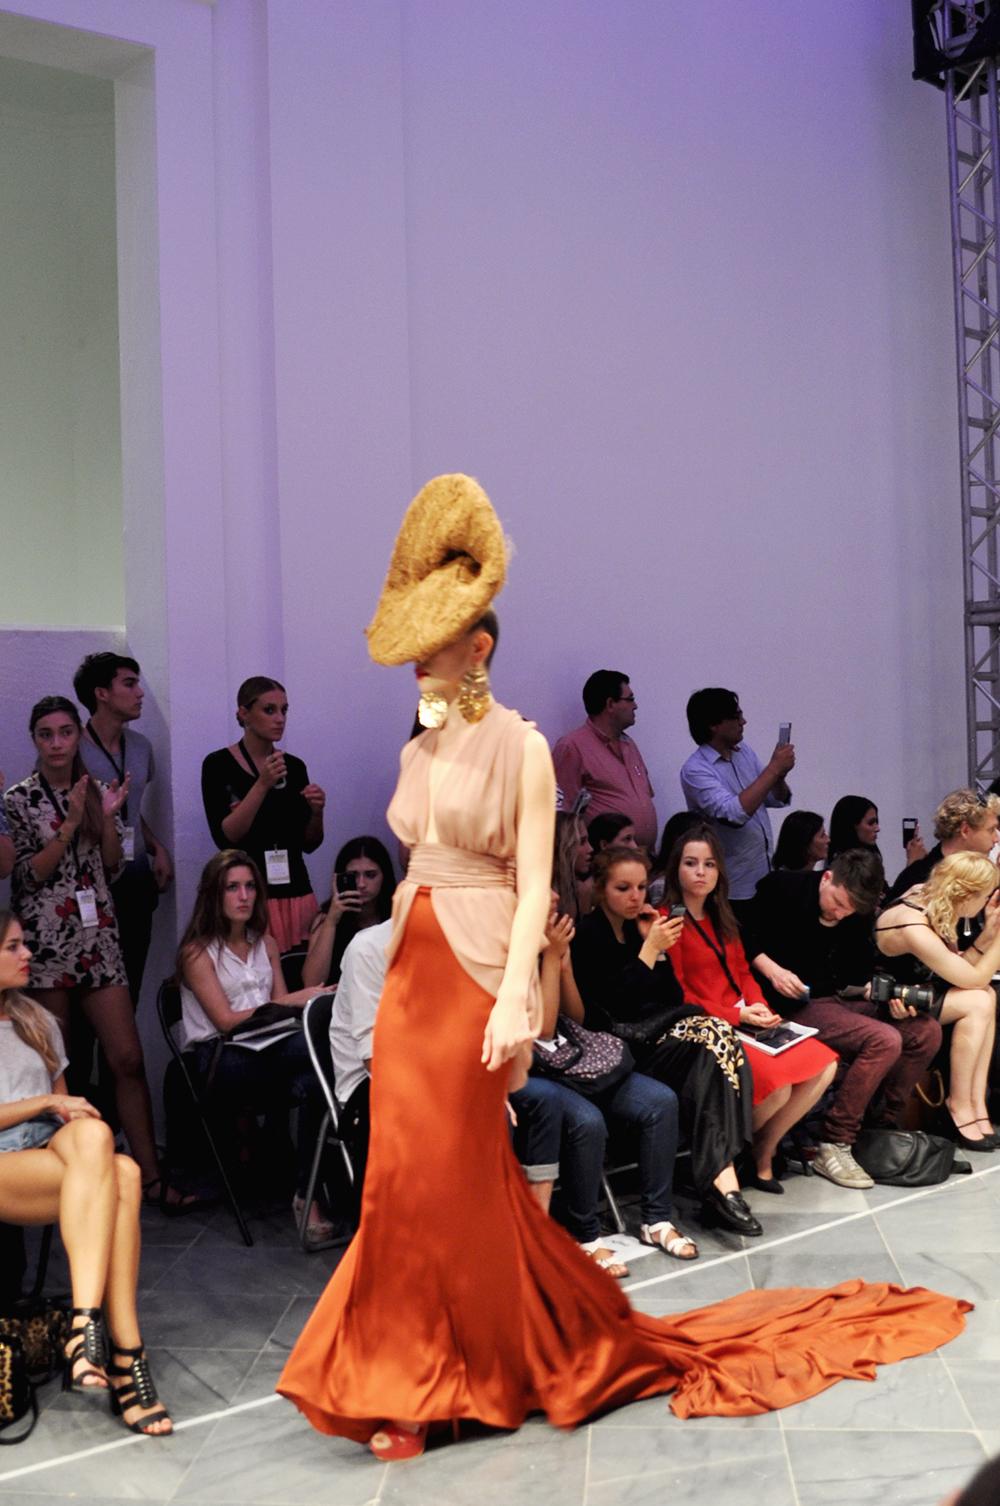 something fashion blog fblogger alexis carballosa, fashion month VFW 17 valencia fashion week, best styling award spring/summer 2015, emerging designers david blay miriam garcia elegant dresses flowy pastel colors museo del carmen